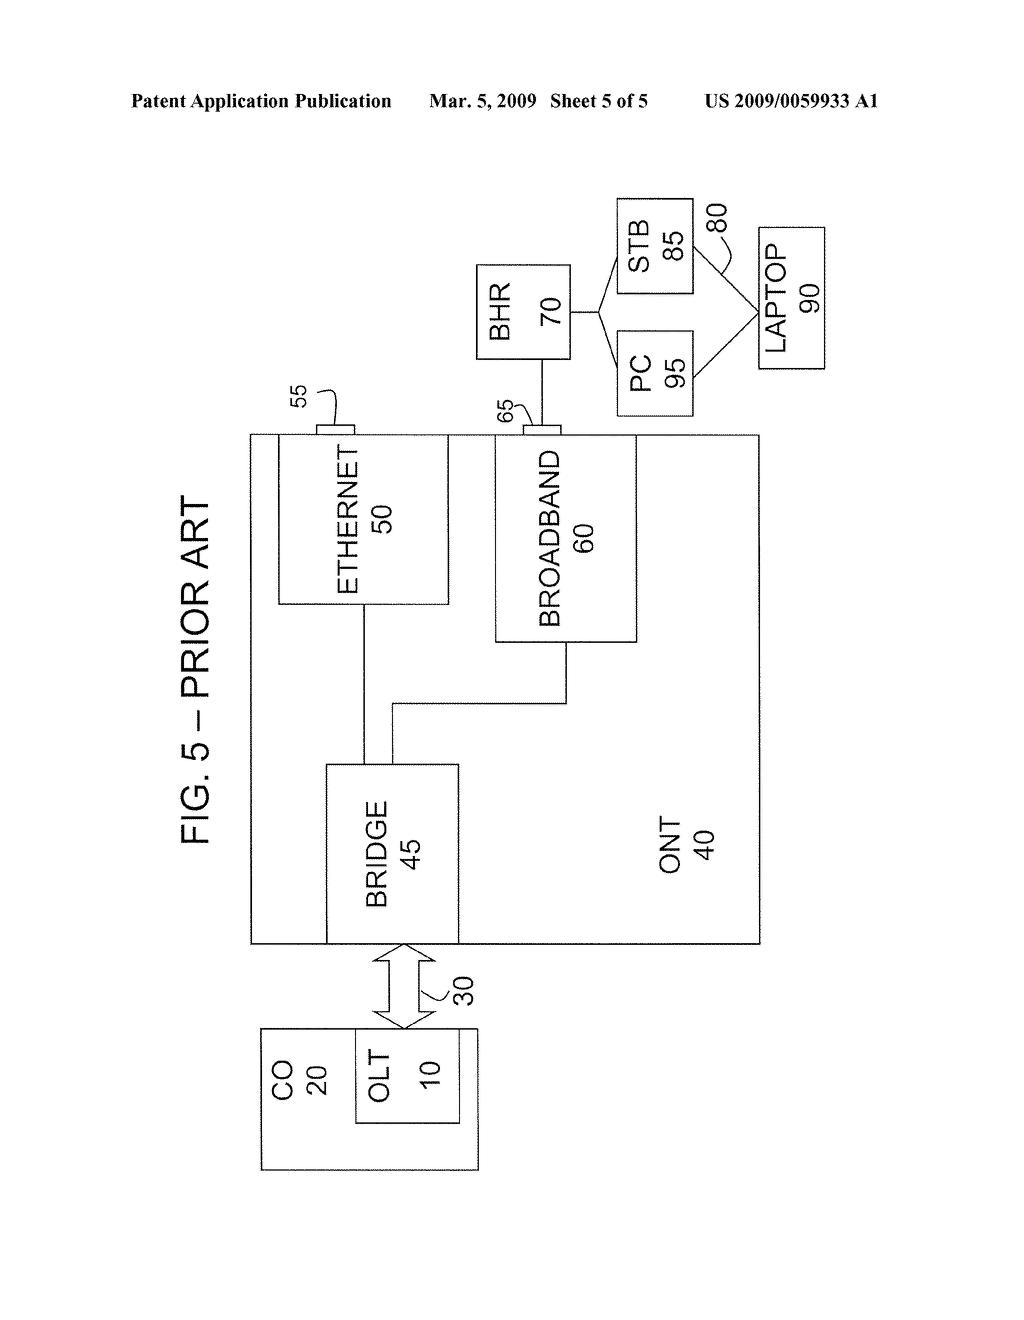 fios tv wiring diagram ceiling light fixture moca bridge circuit and hub